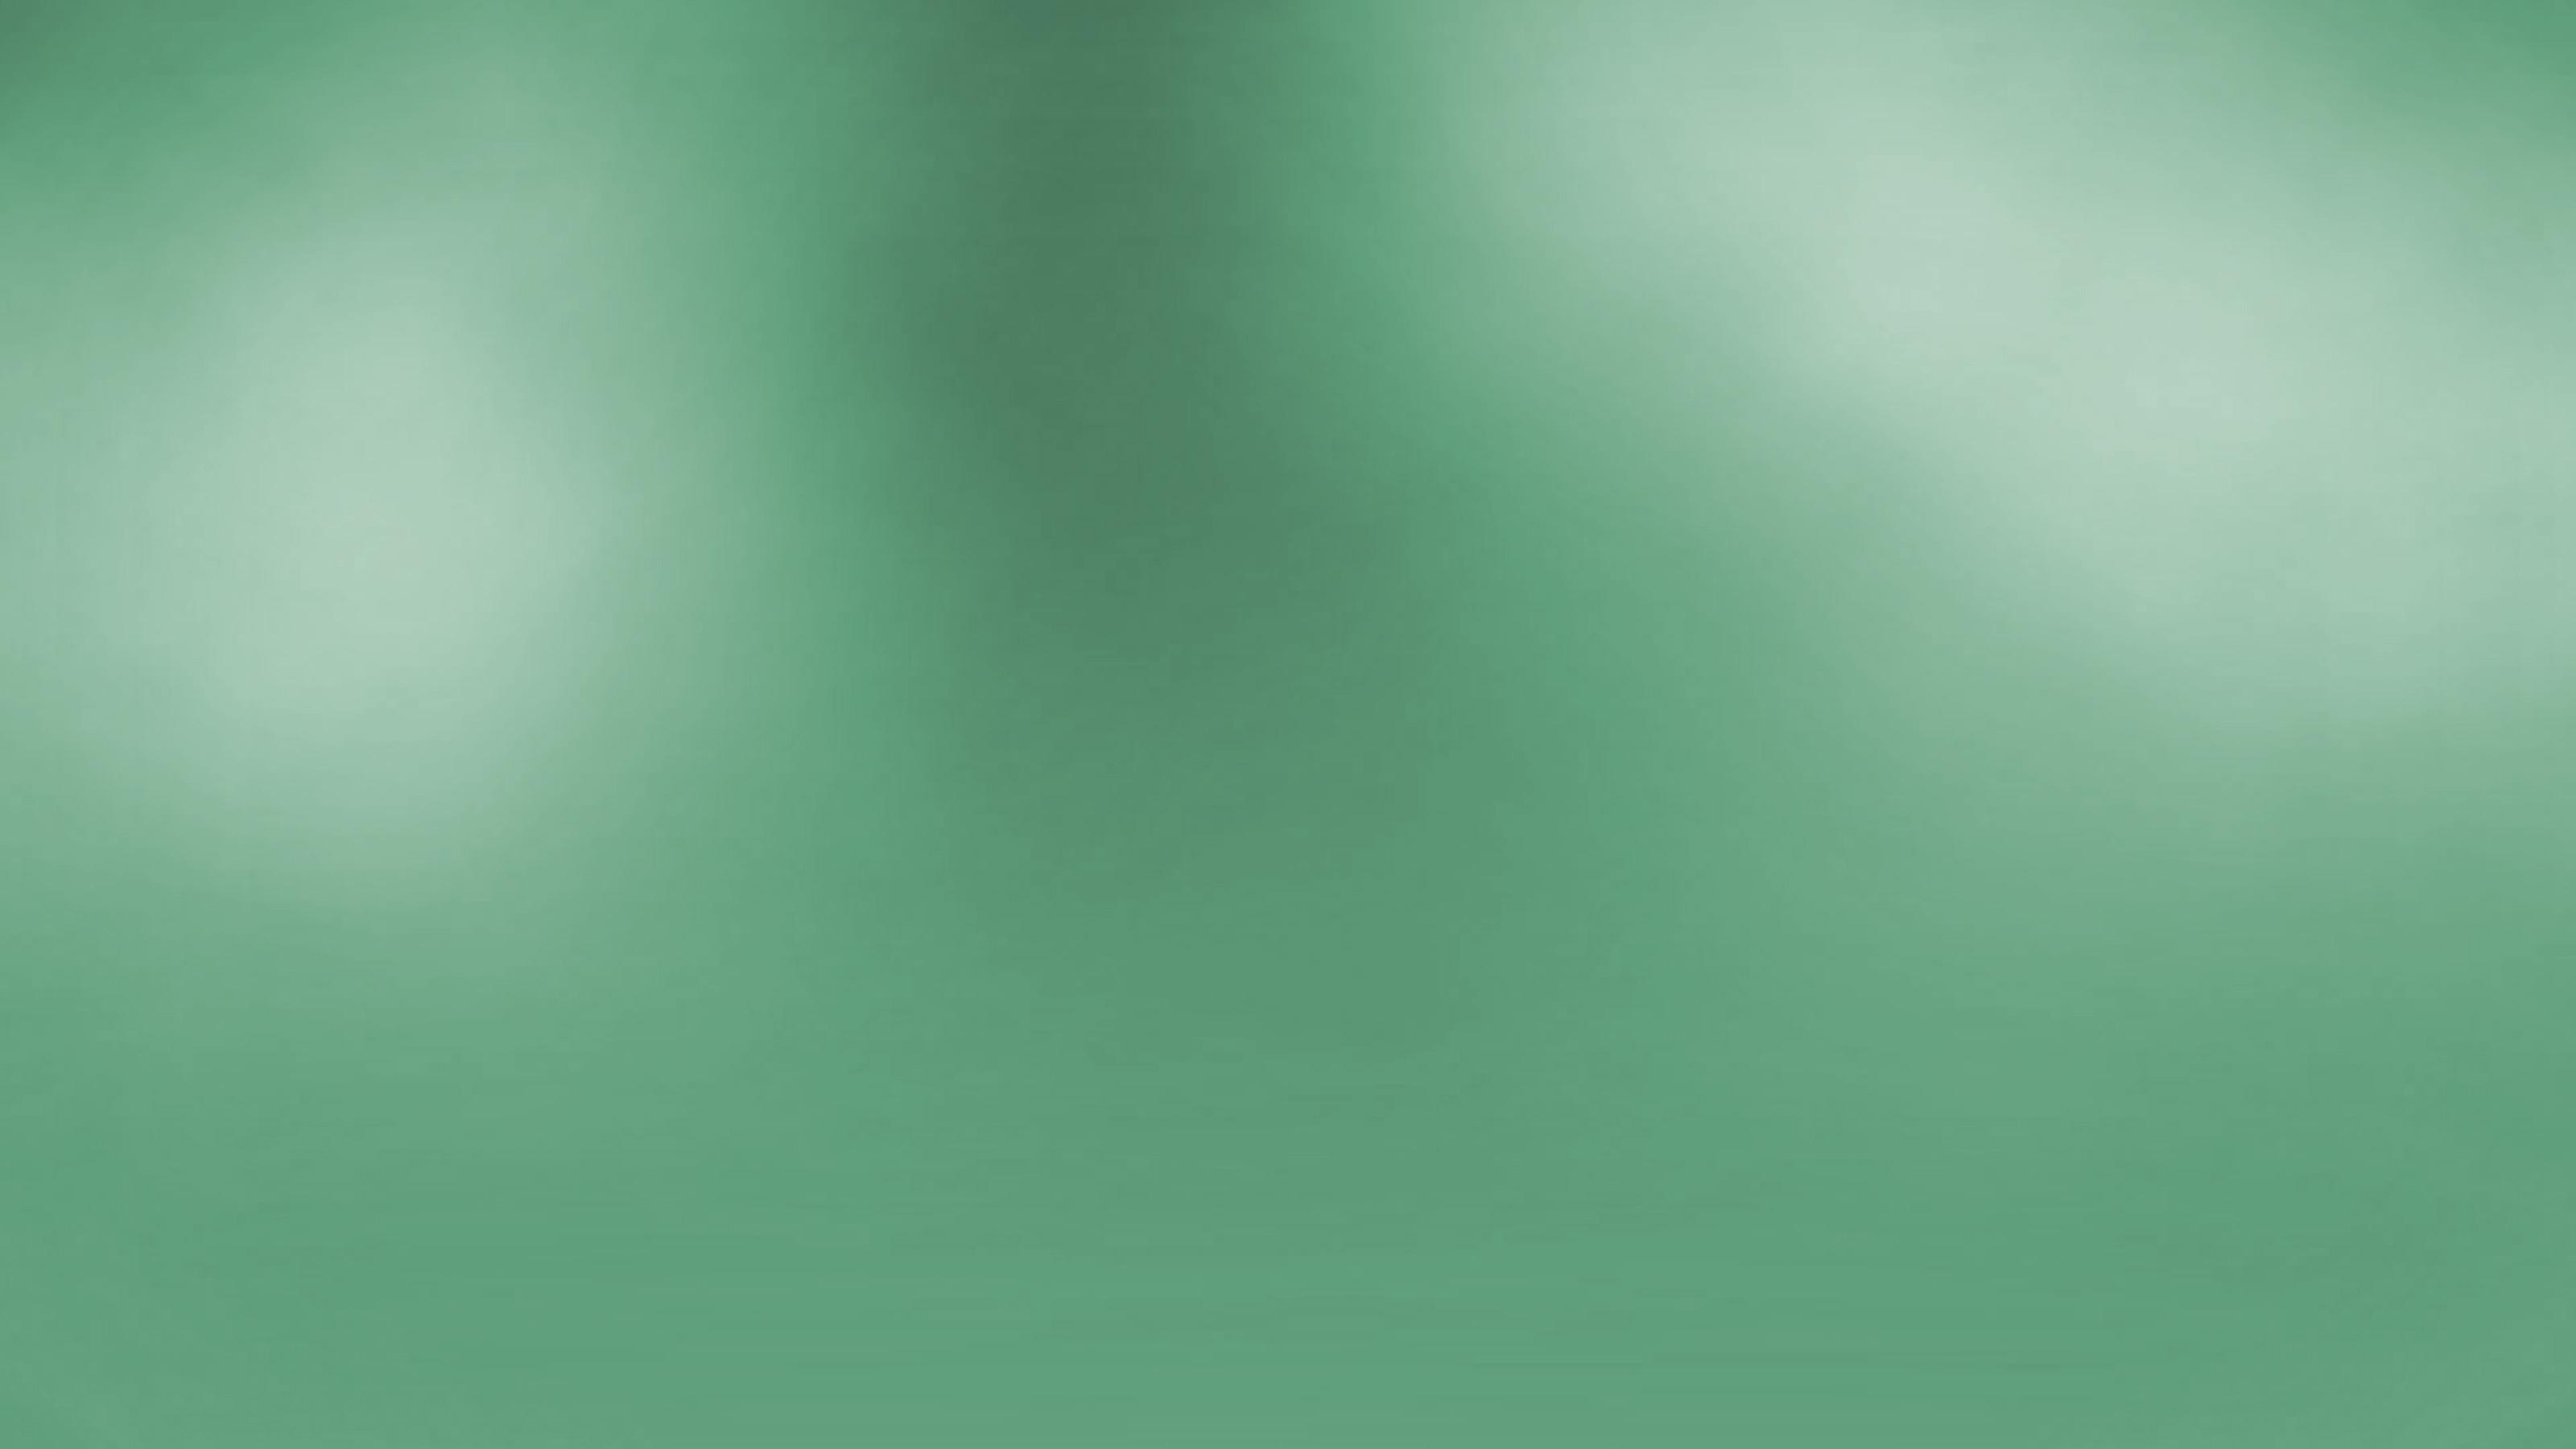 elegant green backgrounds - photo #24